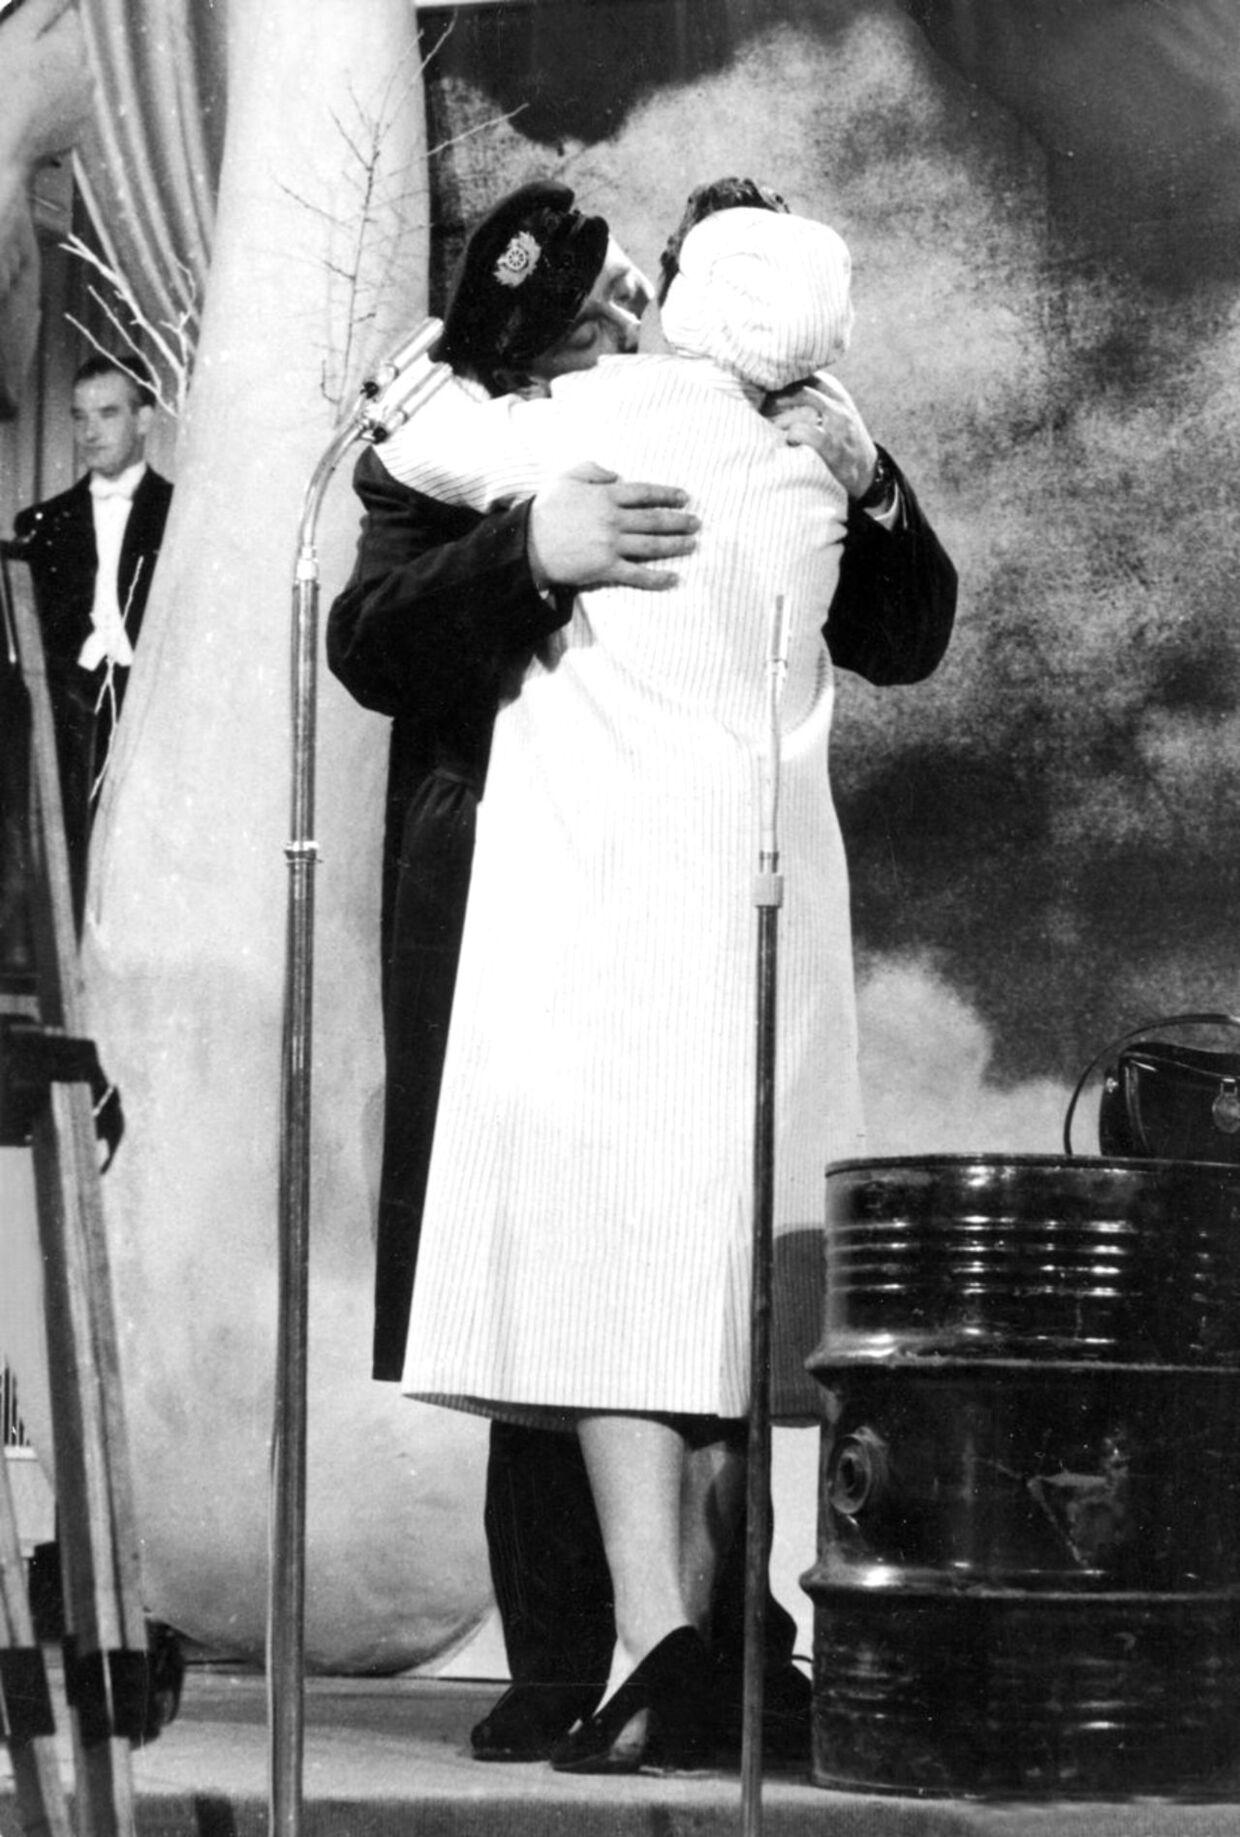 Gustav Winckler og Birthe Wilke og deres berømte kys.